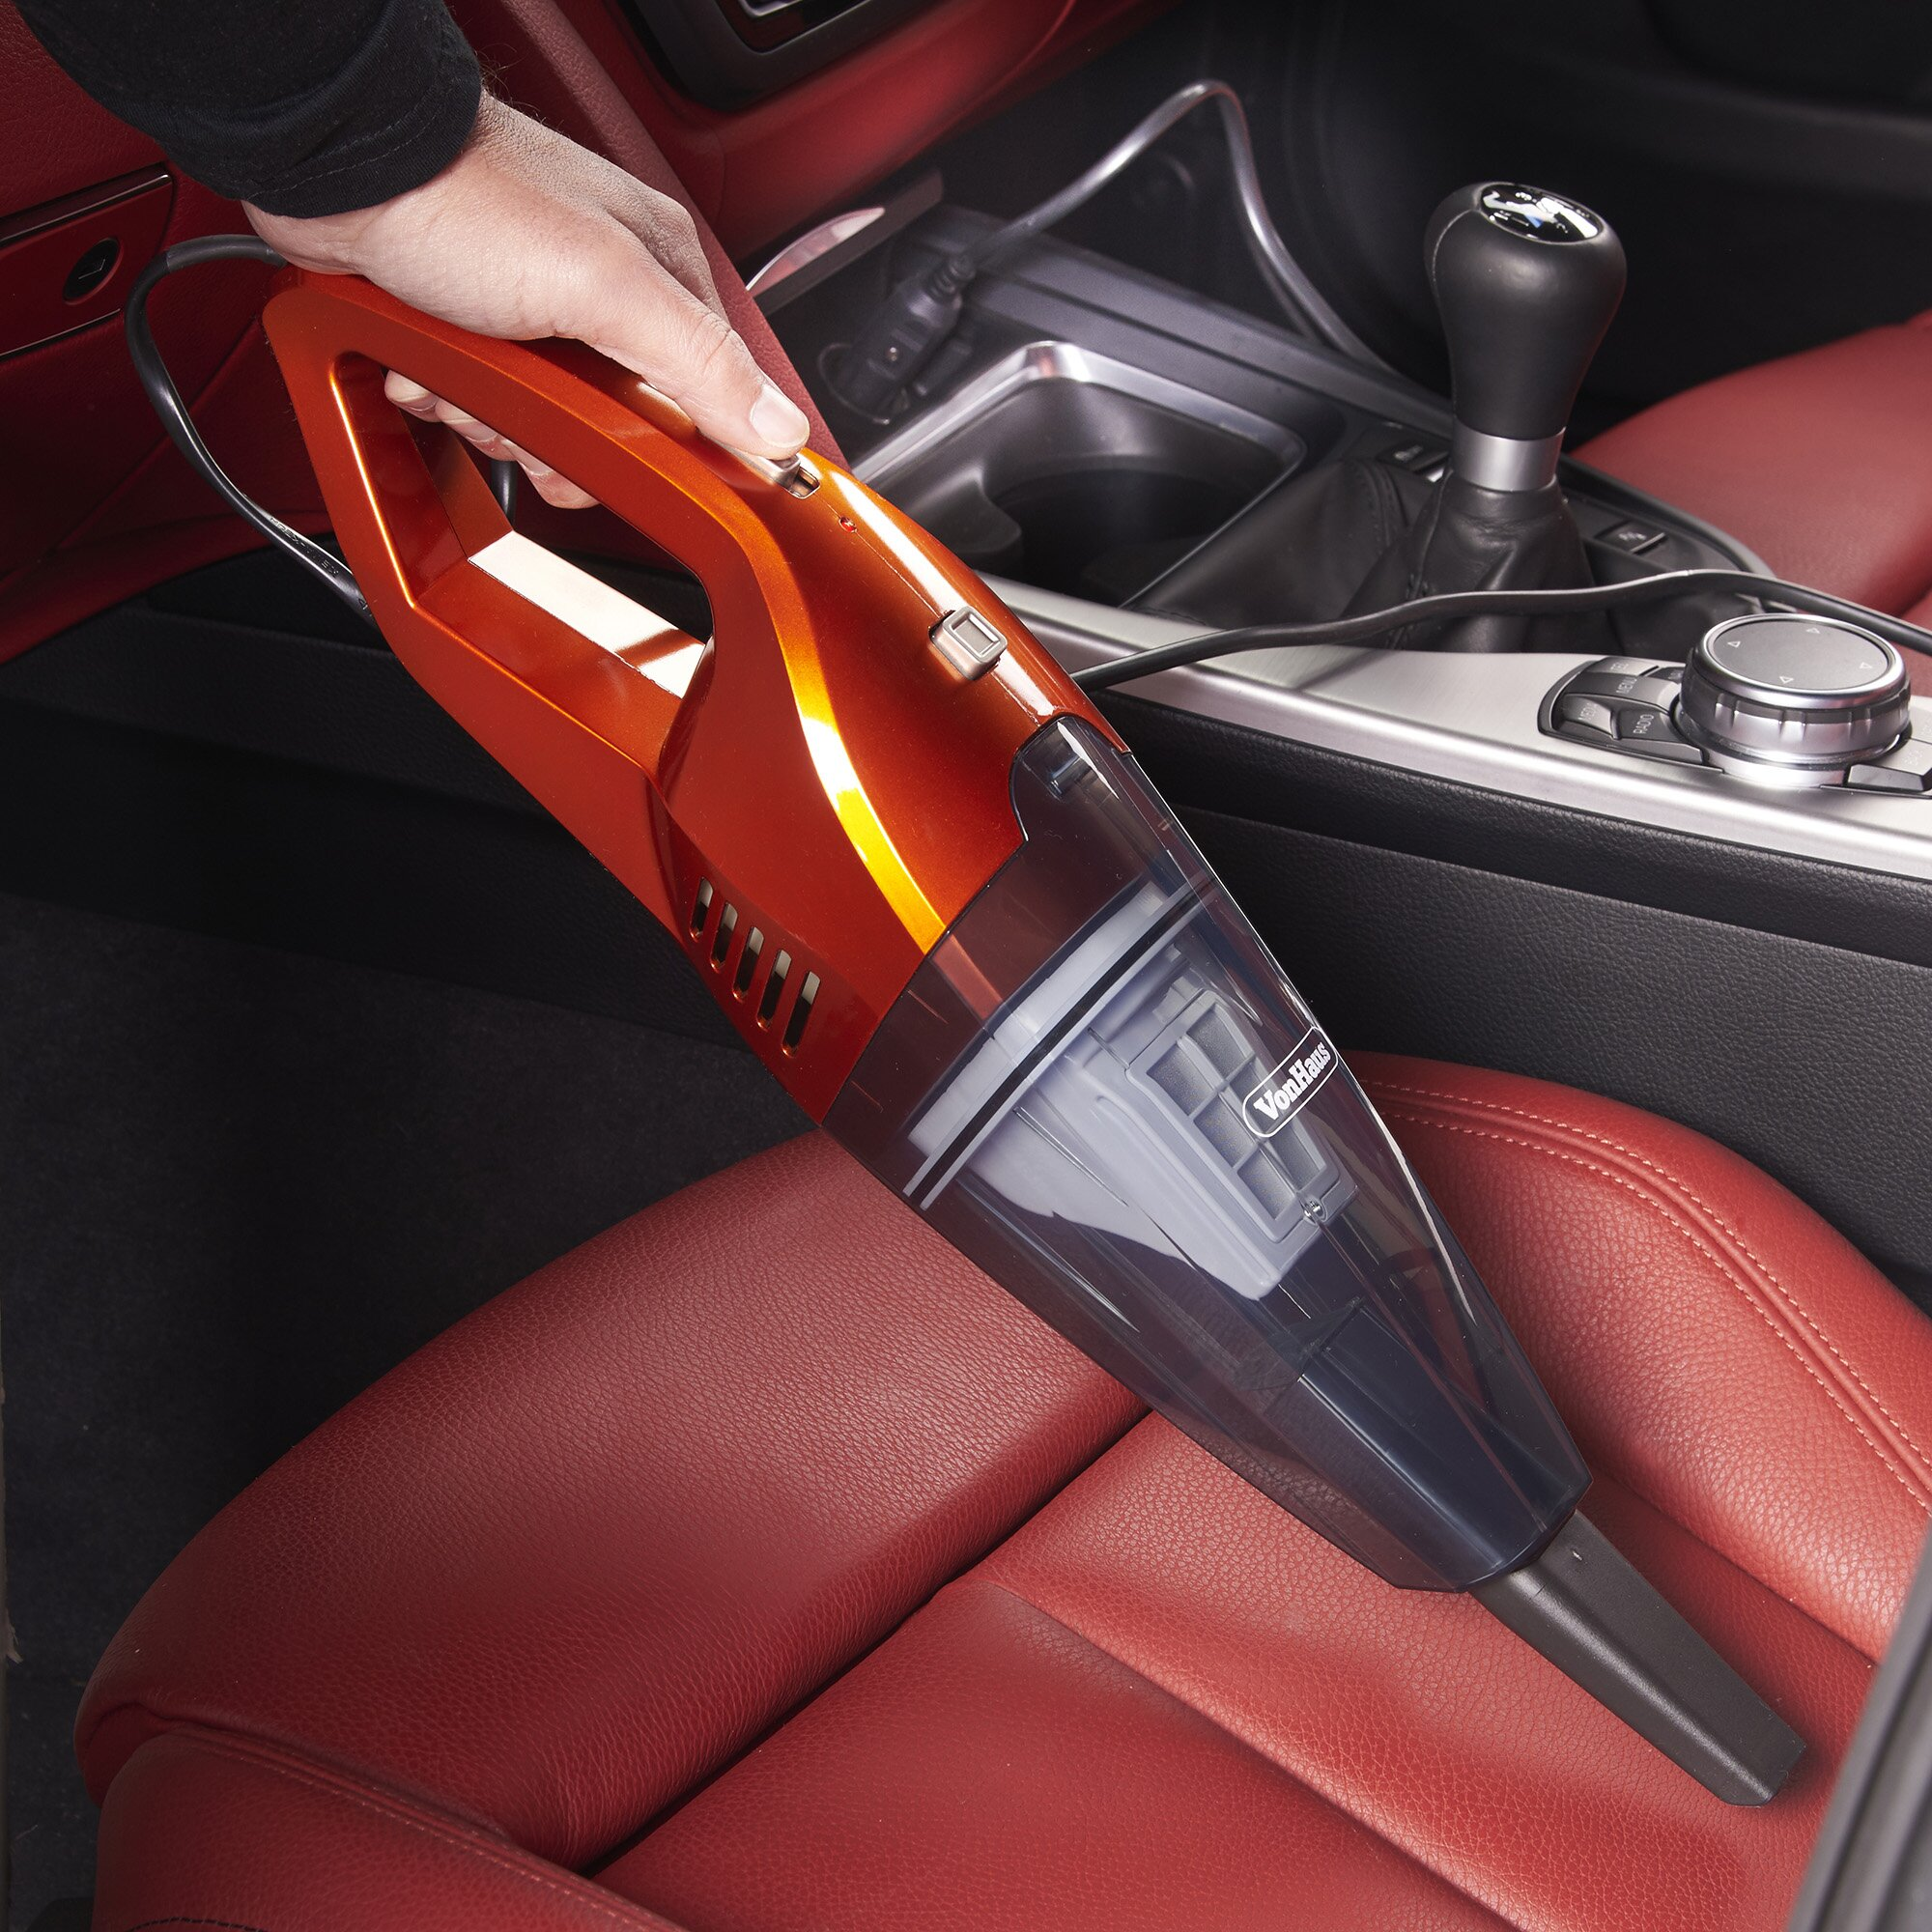 vonhaus 12v car vacuum cleaner reviews wayfair. Black Bedroom Furniture Sets. Home Design Ideas